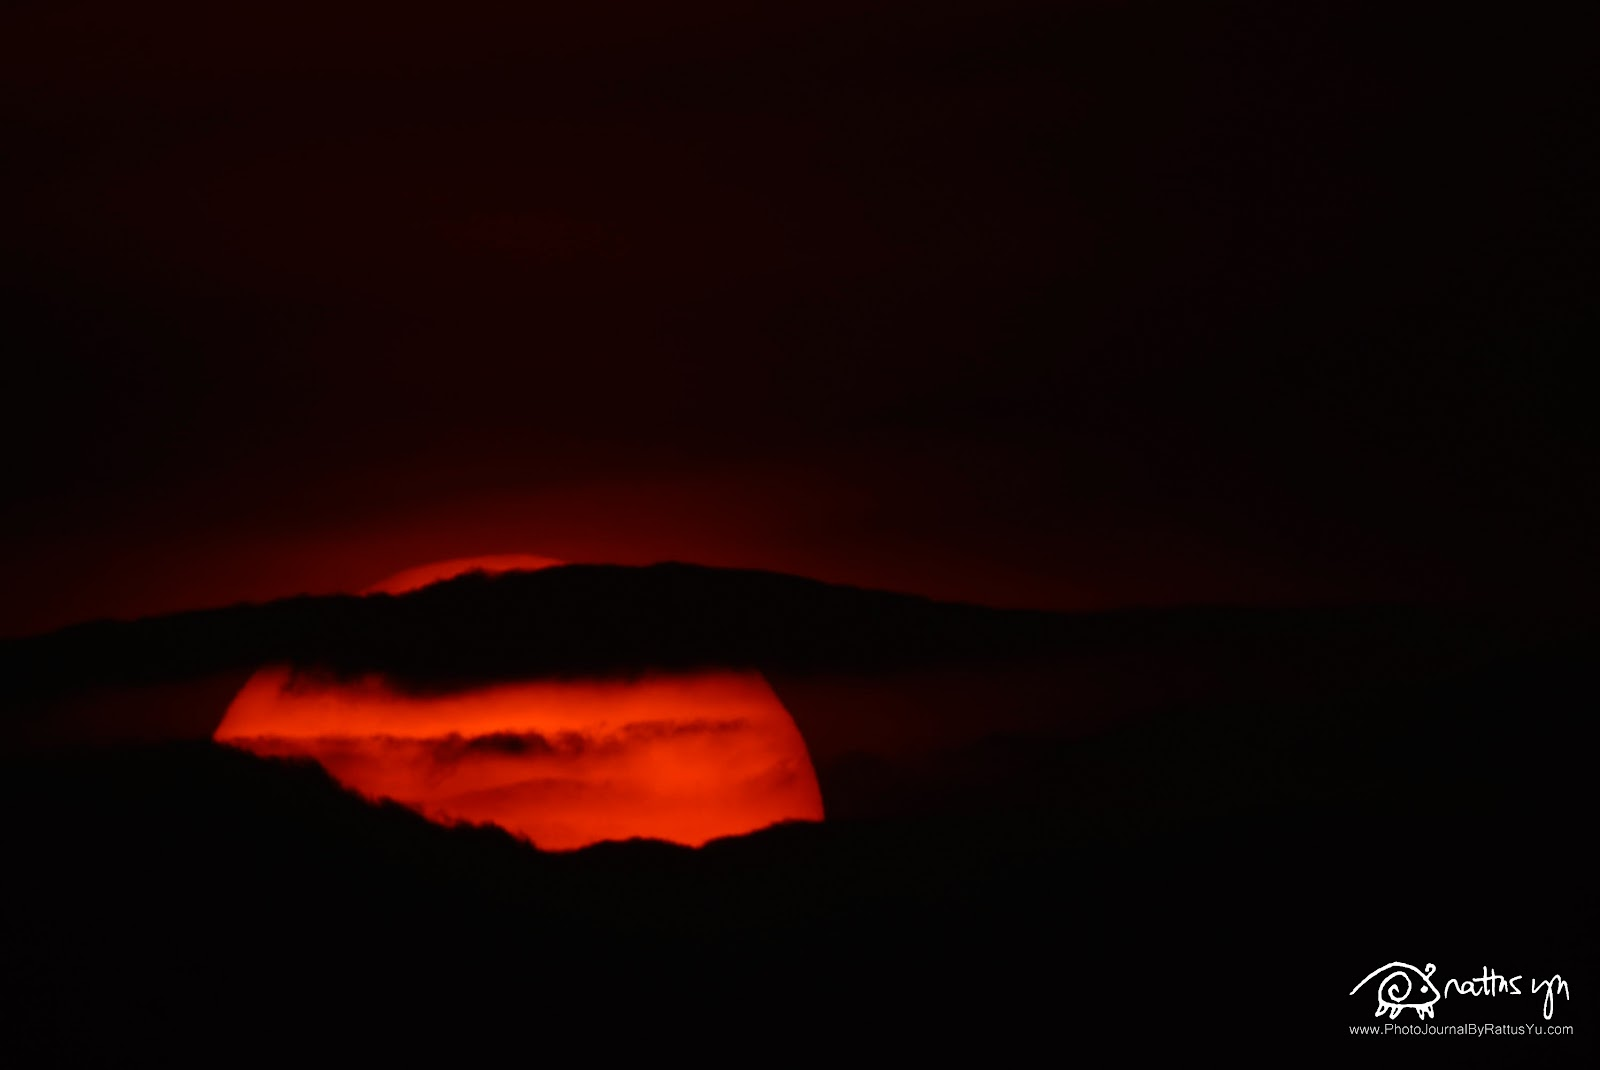 Manila Bay Sunset, Nikon D5200, Reflex-Nikkor C. 500mm f/8, Kenko MC7 2x Tele Plus